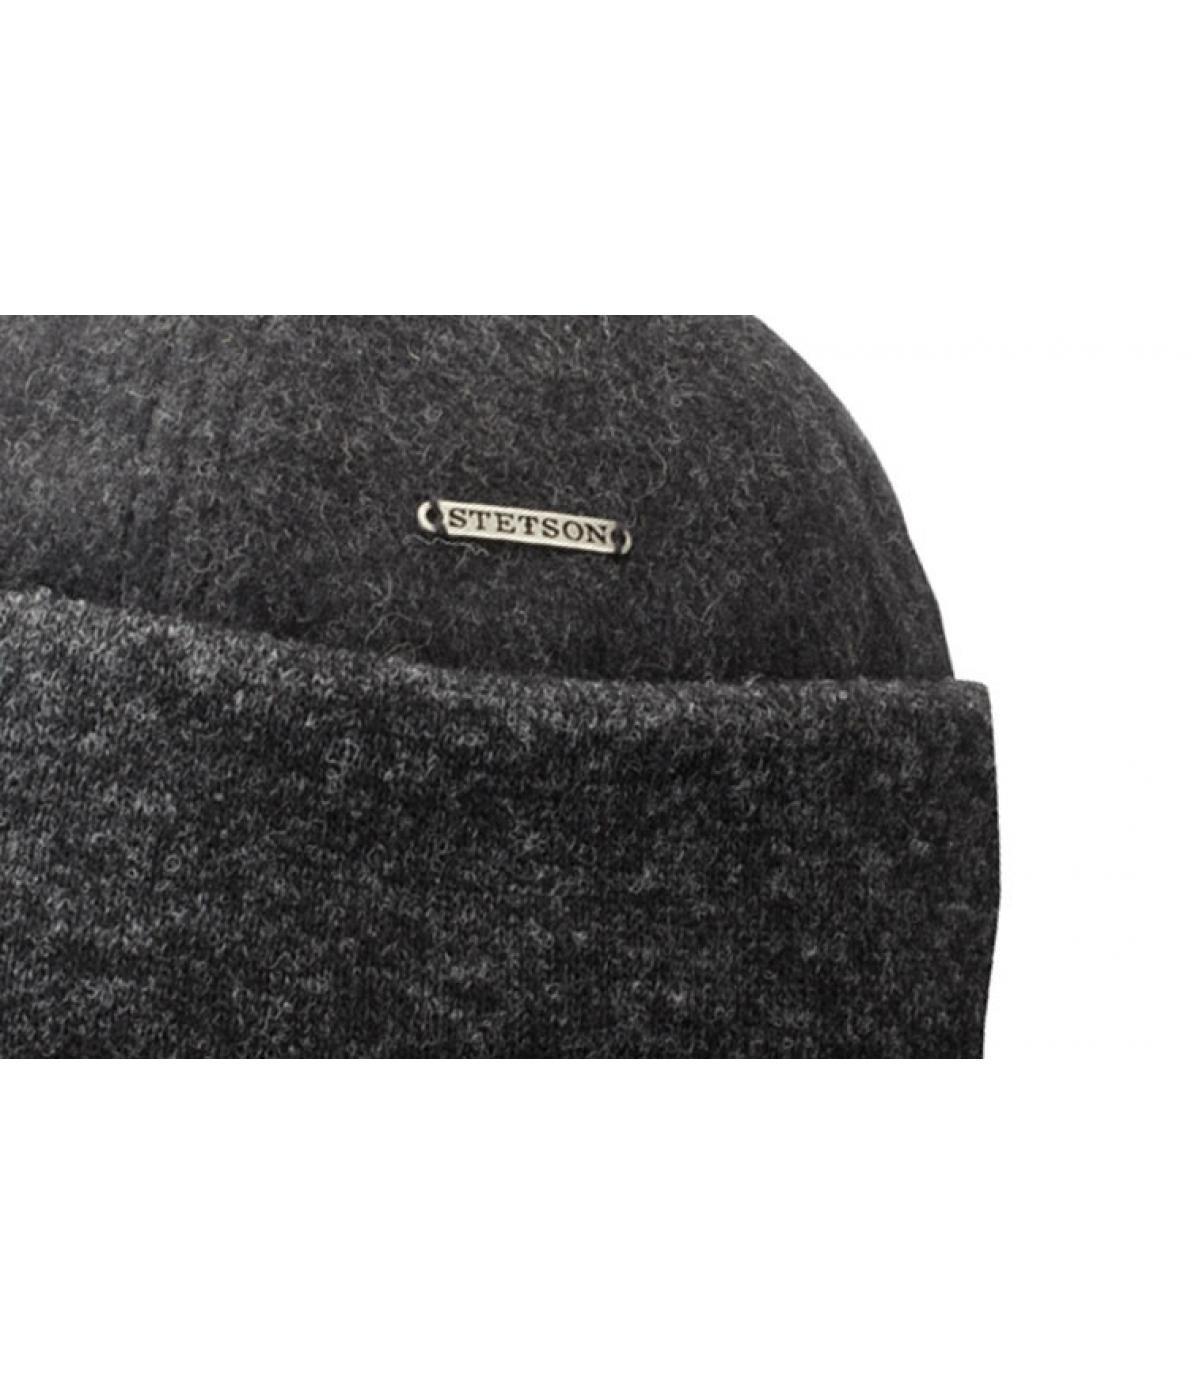 Détails Docker Wool Cashmere grey - image 3